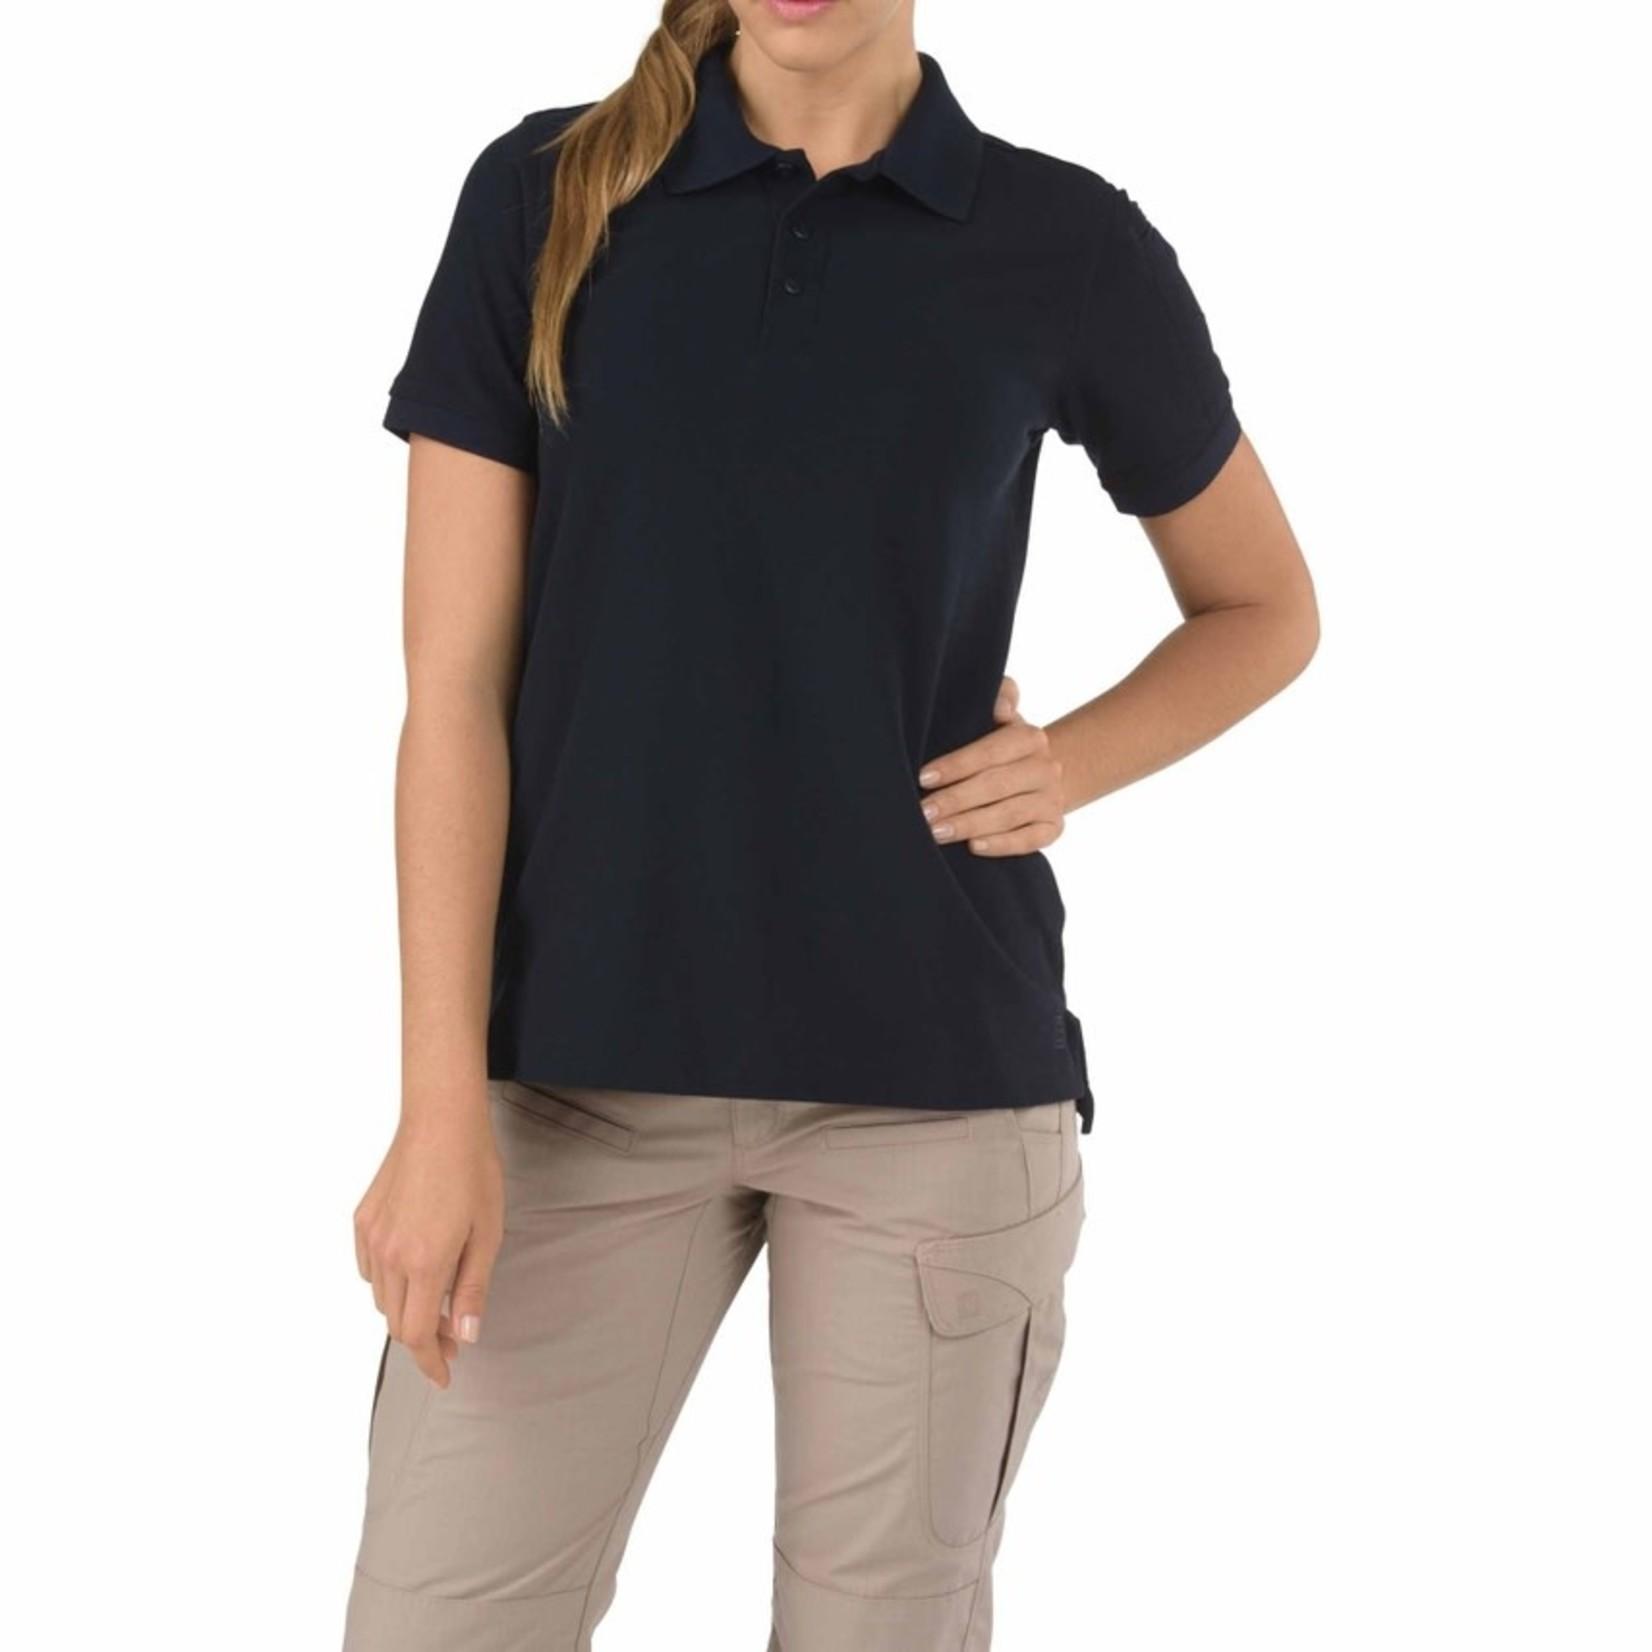 5.11 Tactical 5.11 Women's Professional Polo- Navy- Medium